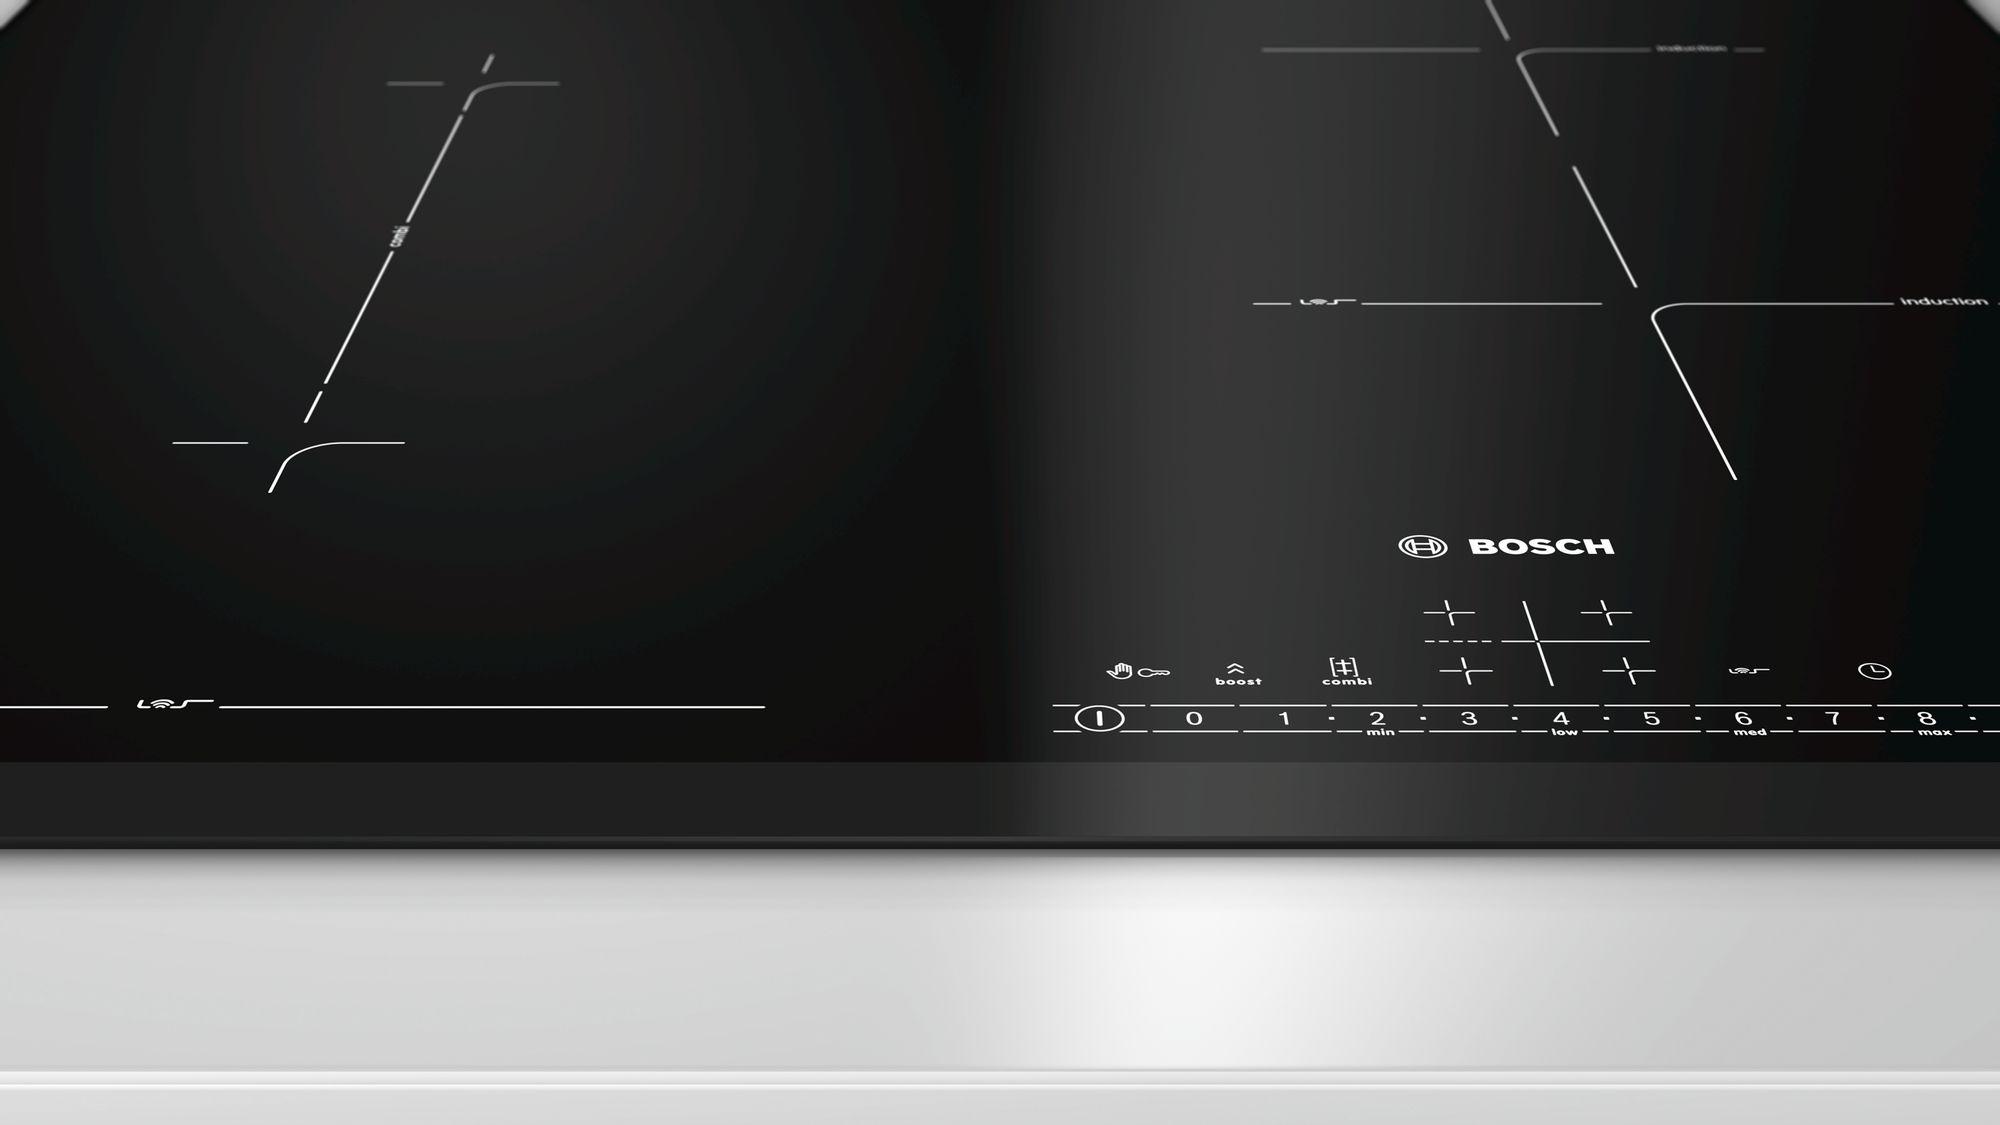 bosch induktionskochfeld pvs651fc1e 60cm autark bratsensor einbau flex haushaltsgro ger te. Black Bedroom Furniture Sets. Home Design Ideas